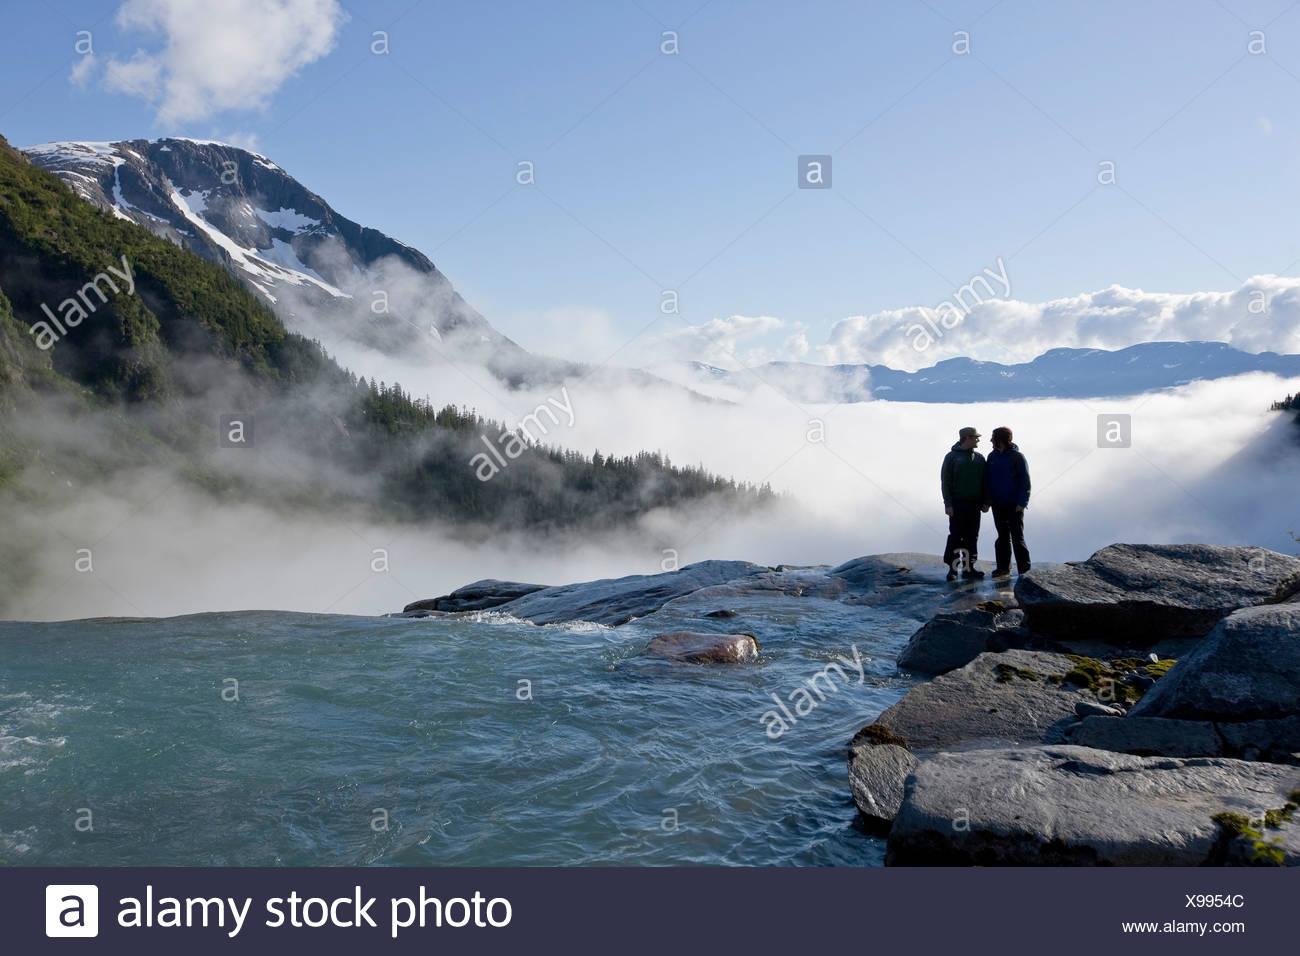 Two people overlook the brink of Sockeye Falls originating in the Juneau Icefield, Taku River Valley below in Southeast Alaska - Stock Image